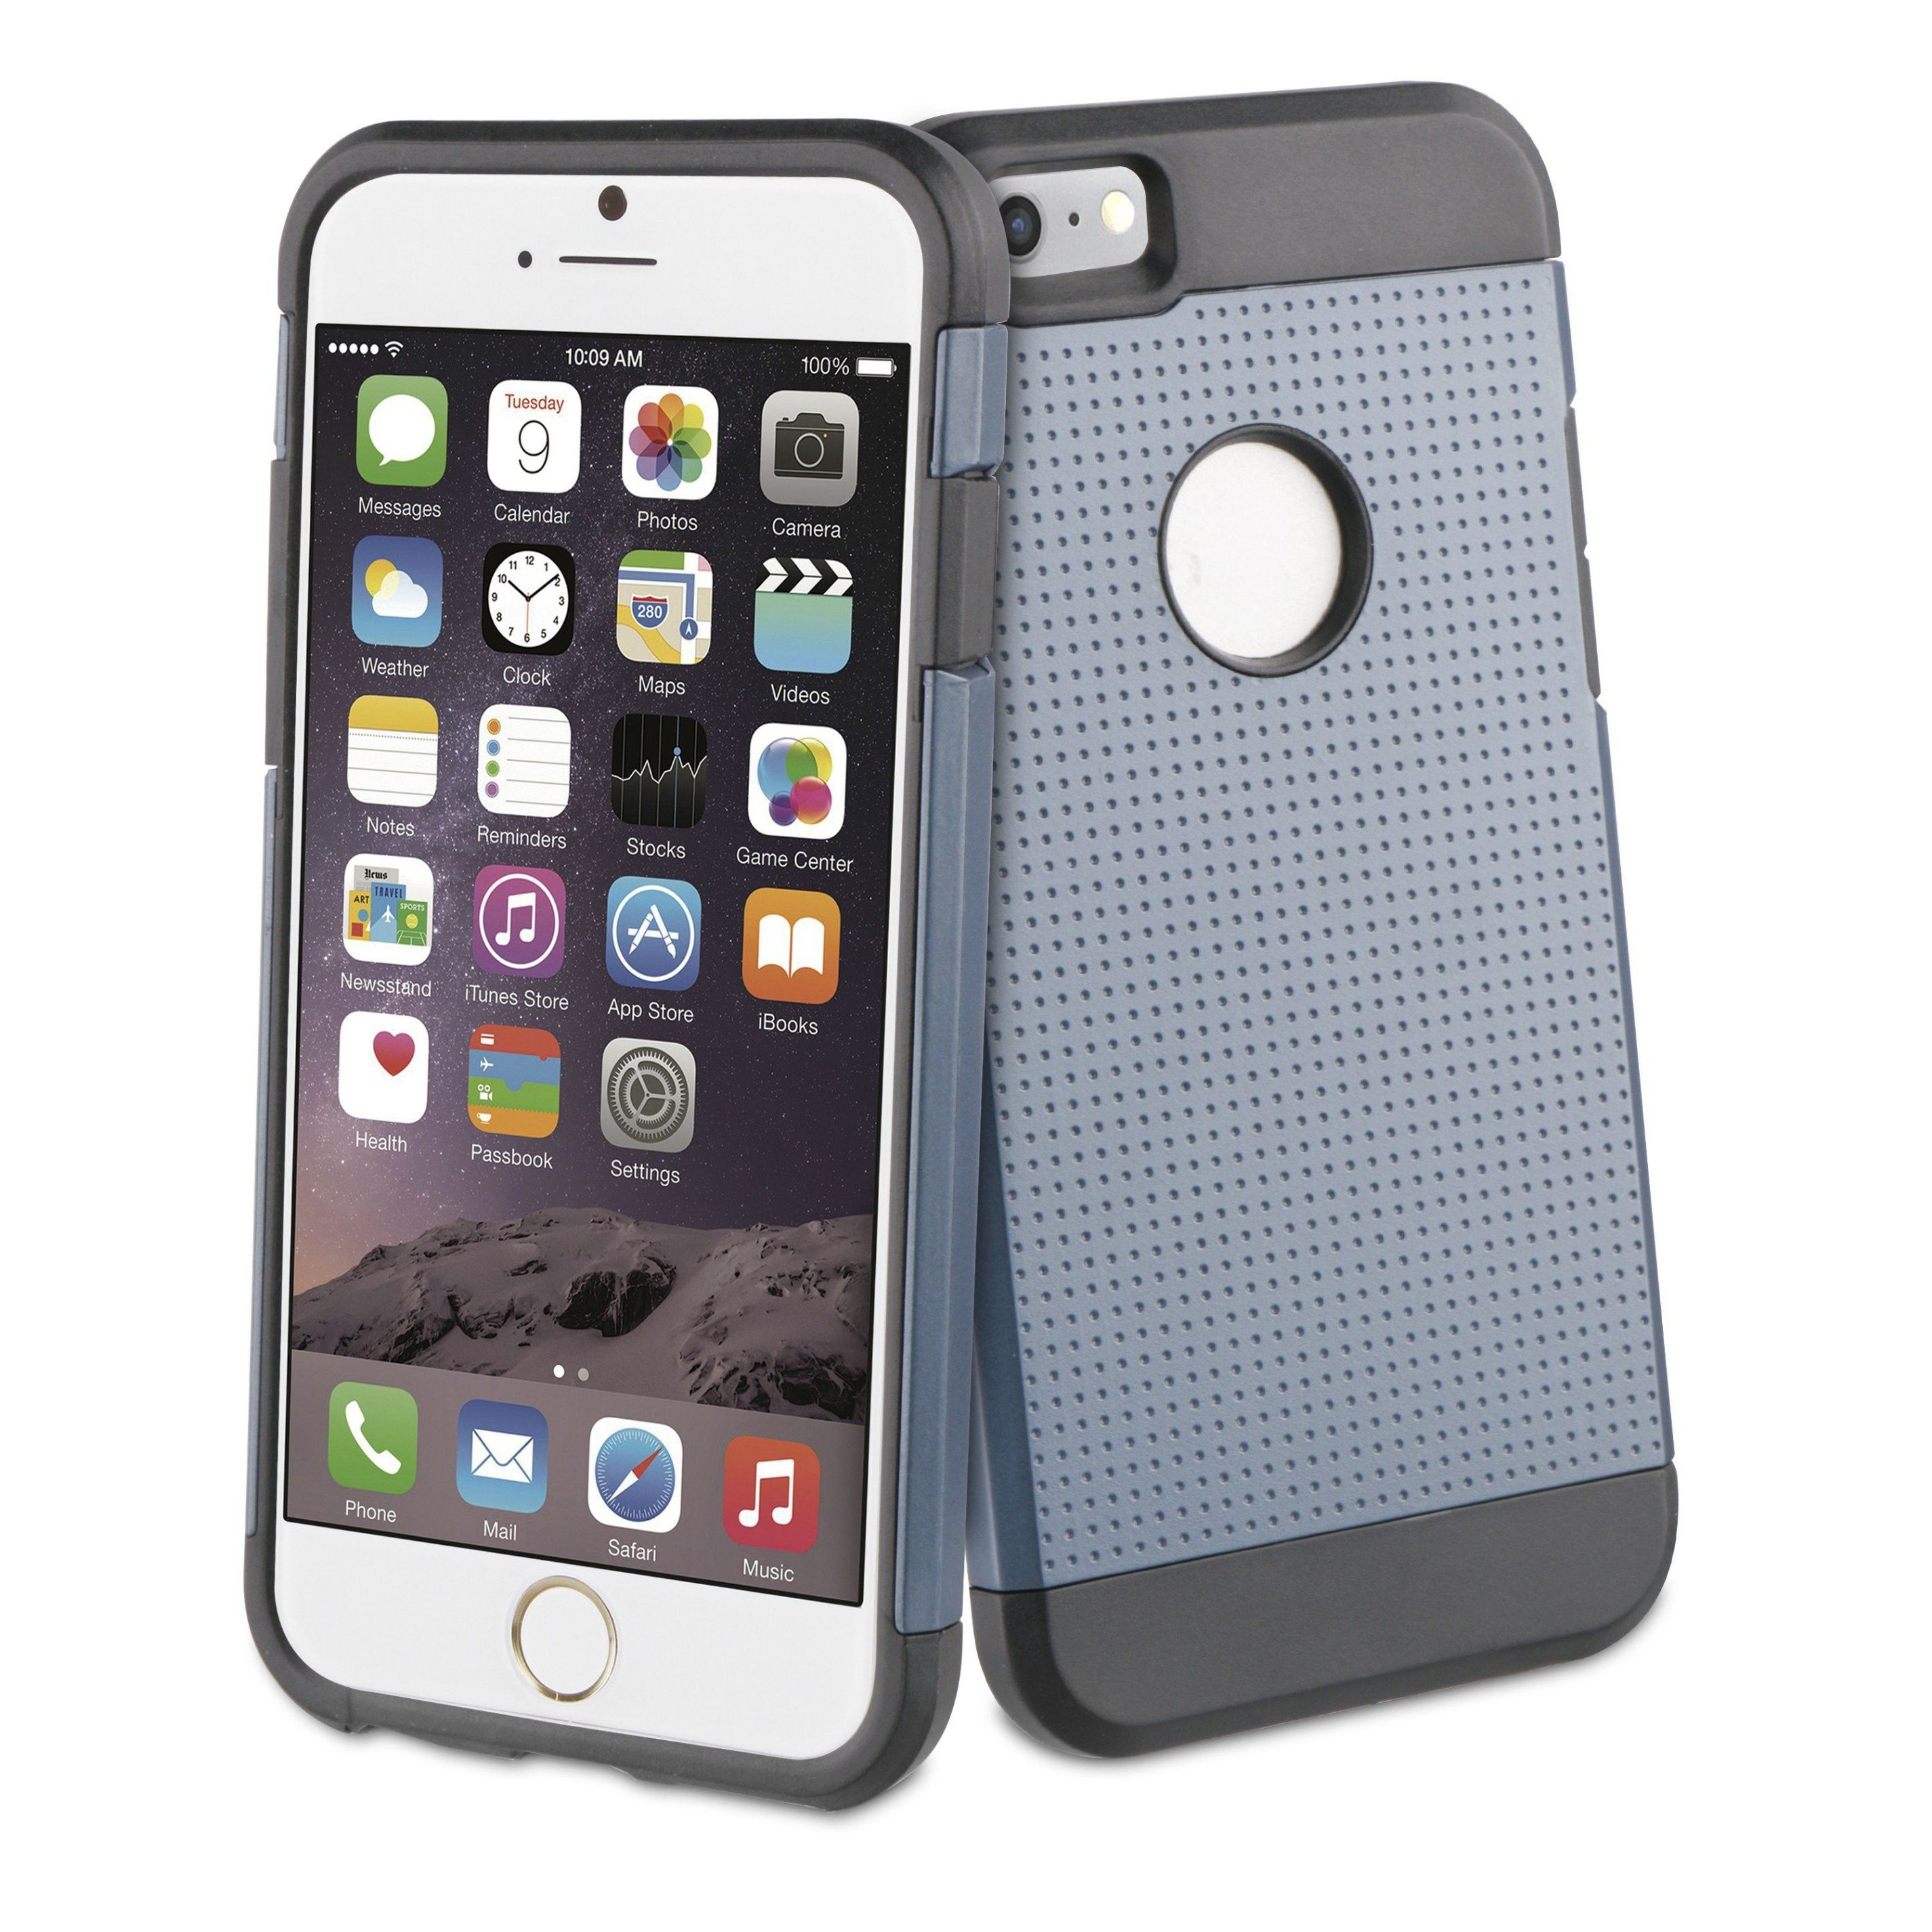 Carcasa para iPhone 6 Muvit Shockproof 2a Generación Gris Plata